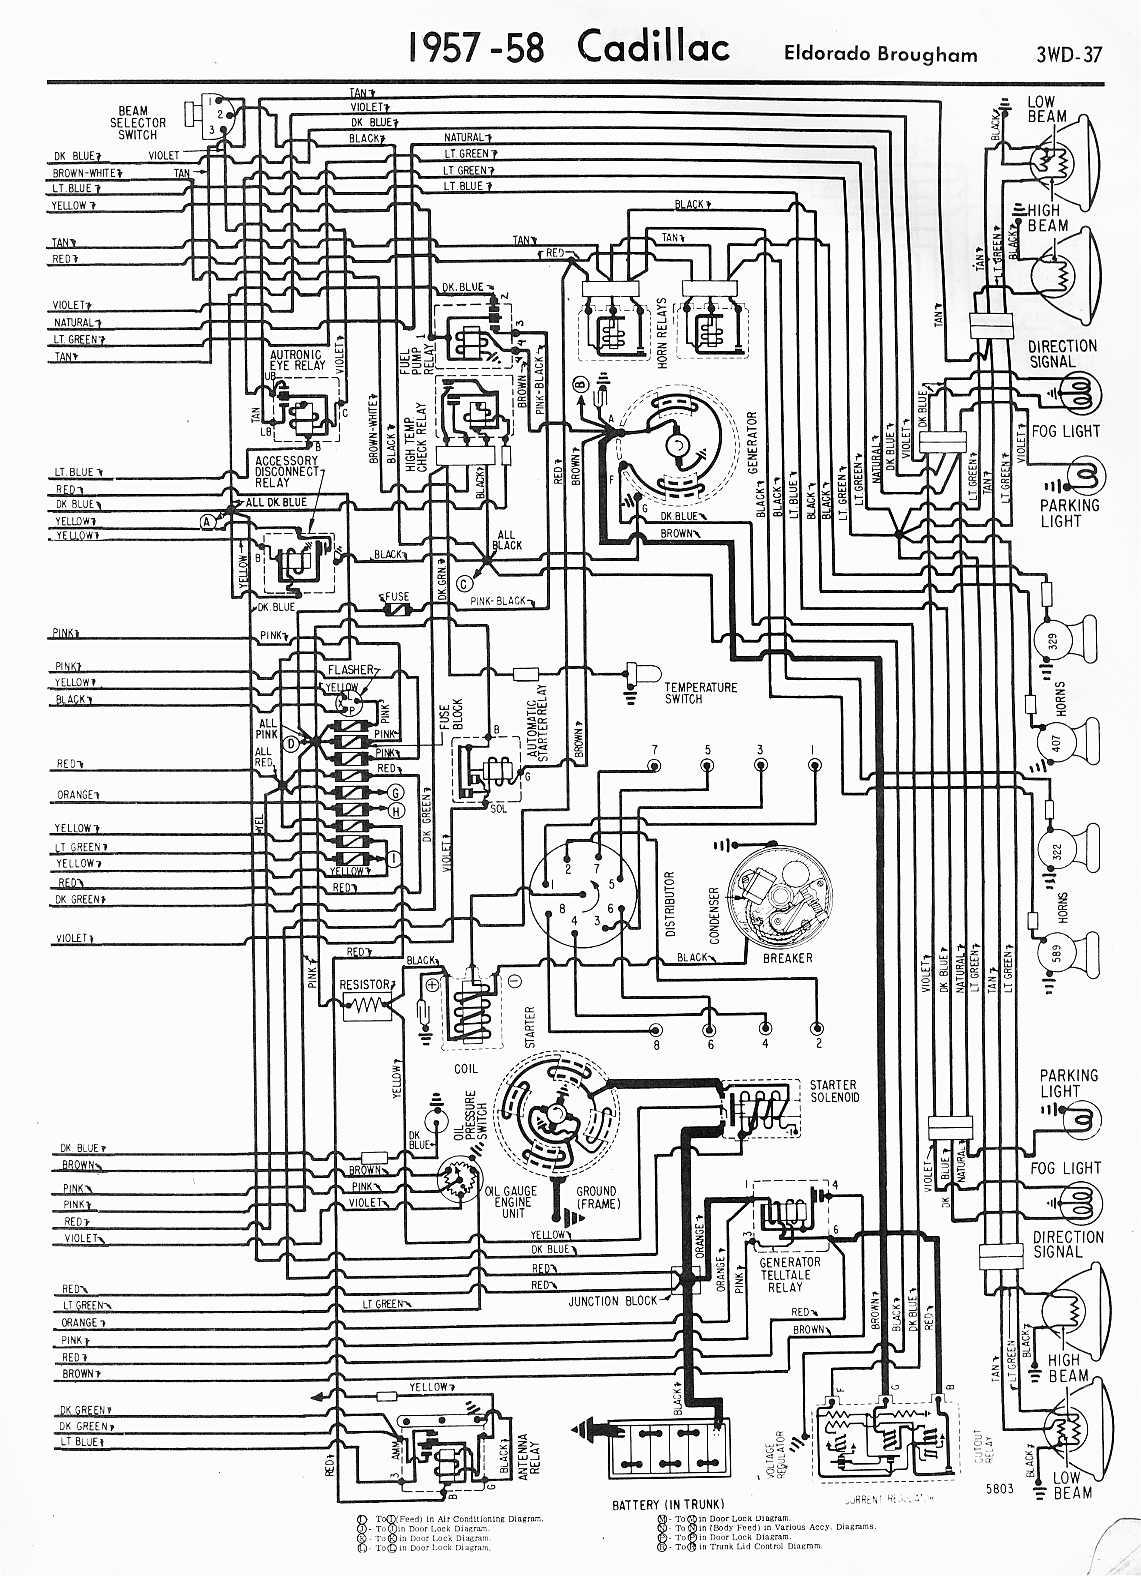 Cadillac Wiring Diagrams Jayco Swan Trailer Diagram Steering Column Get Free Image